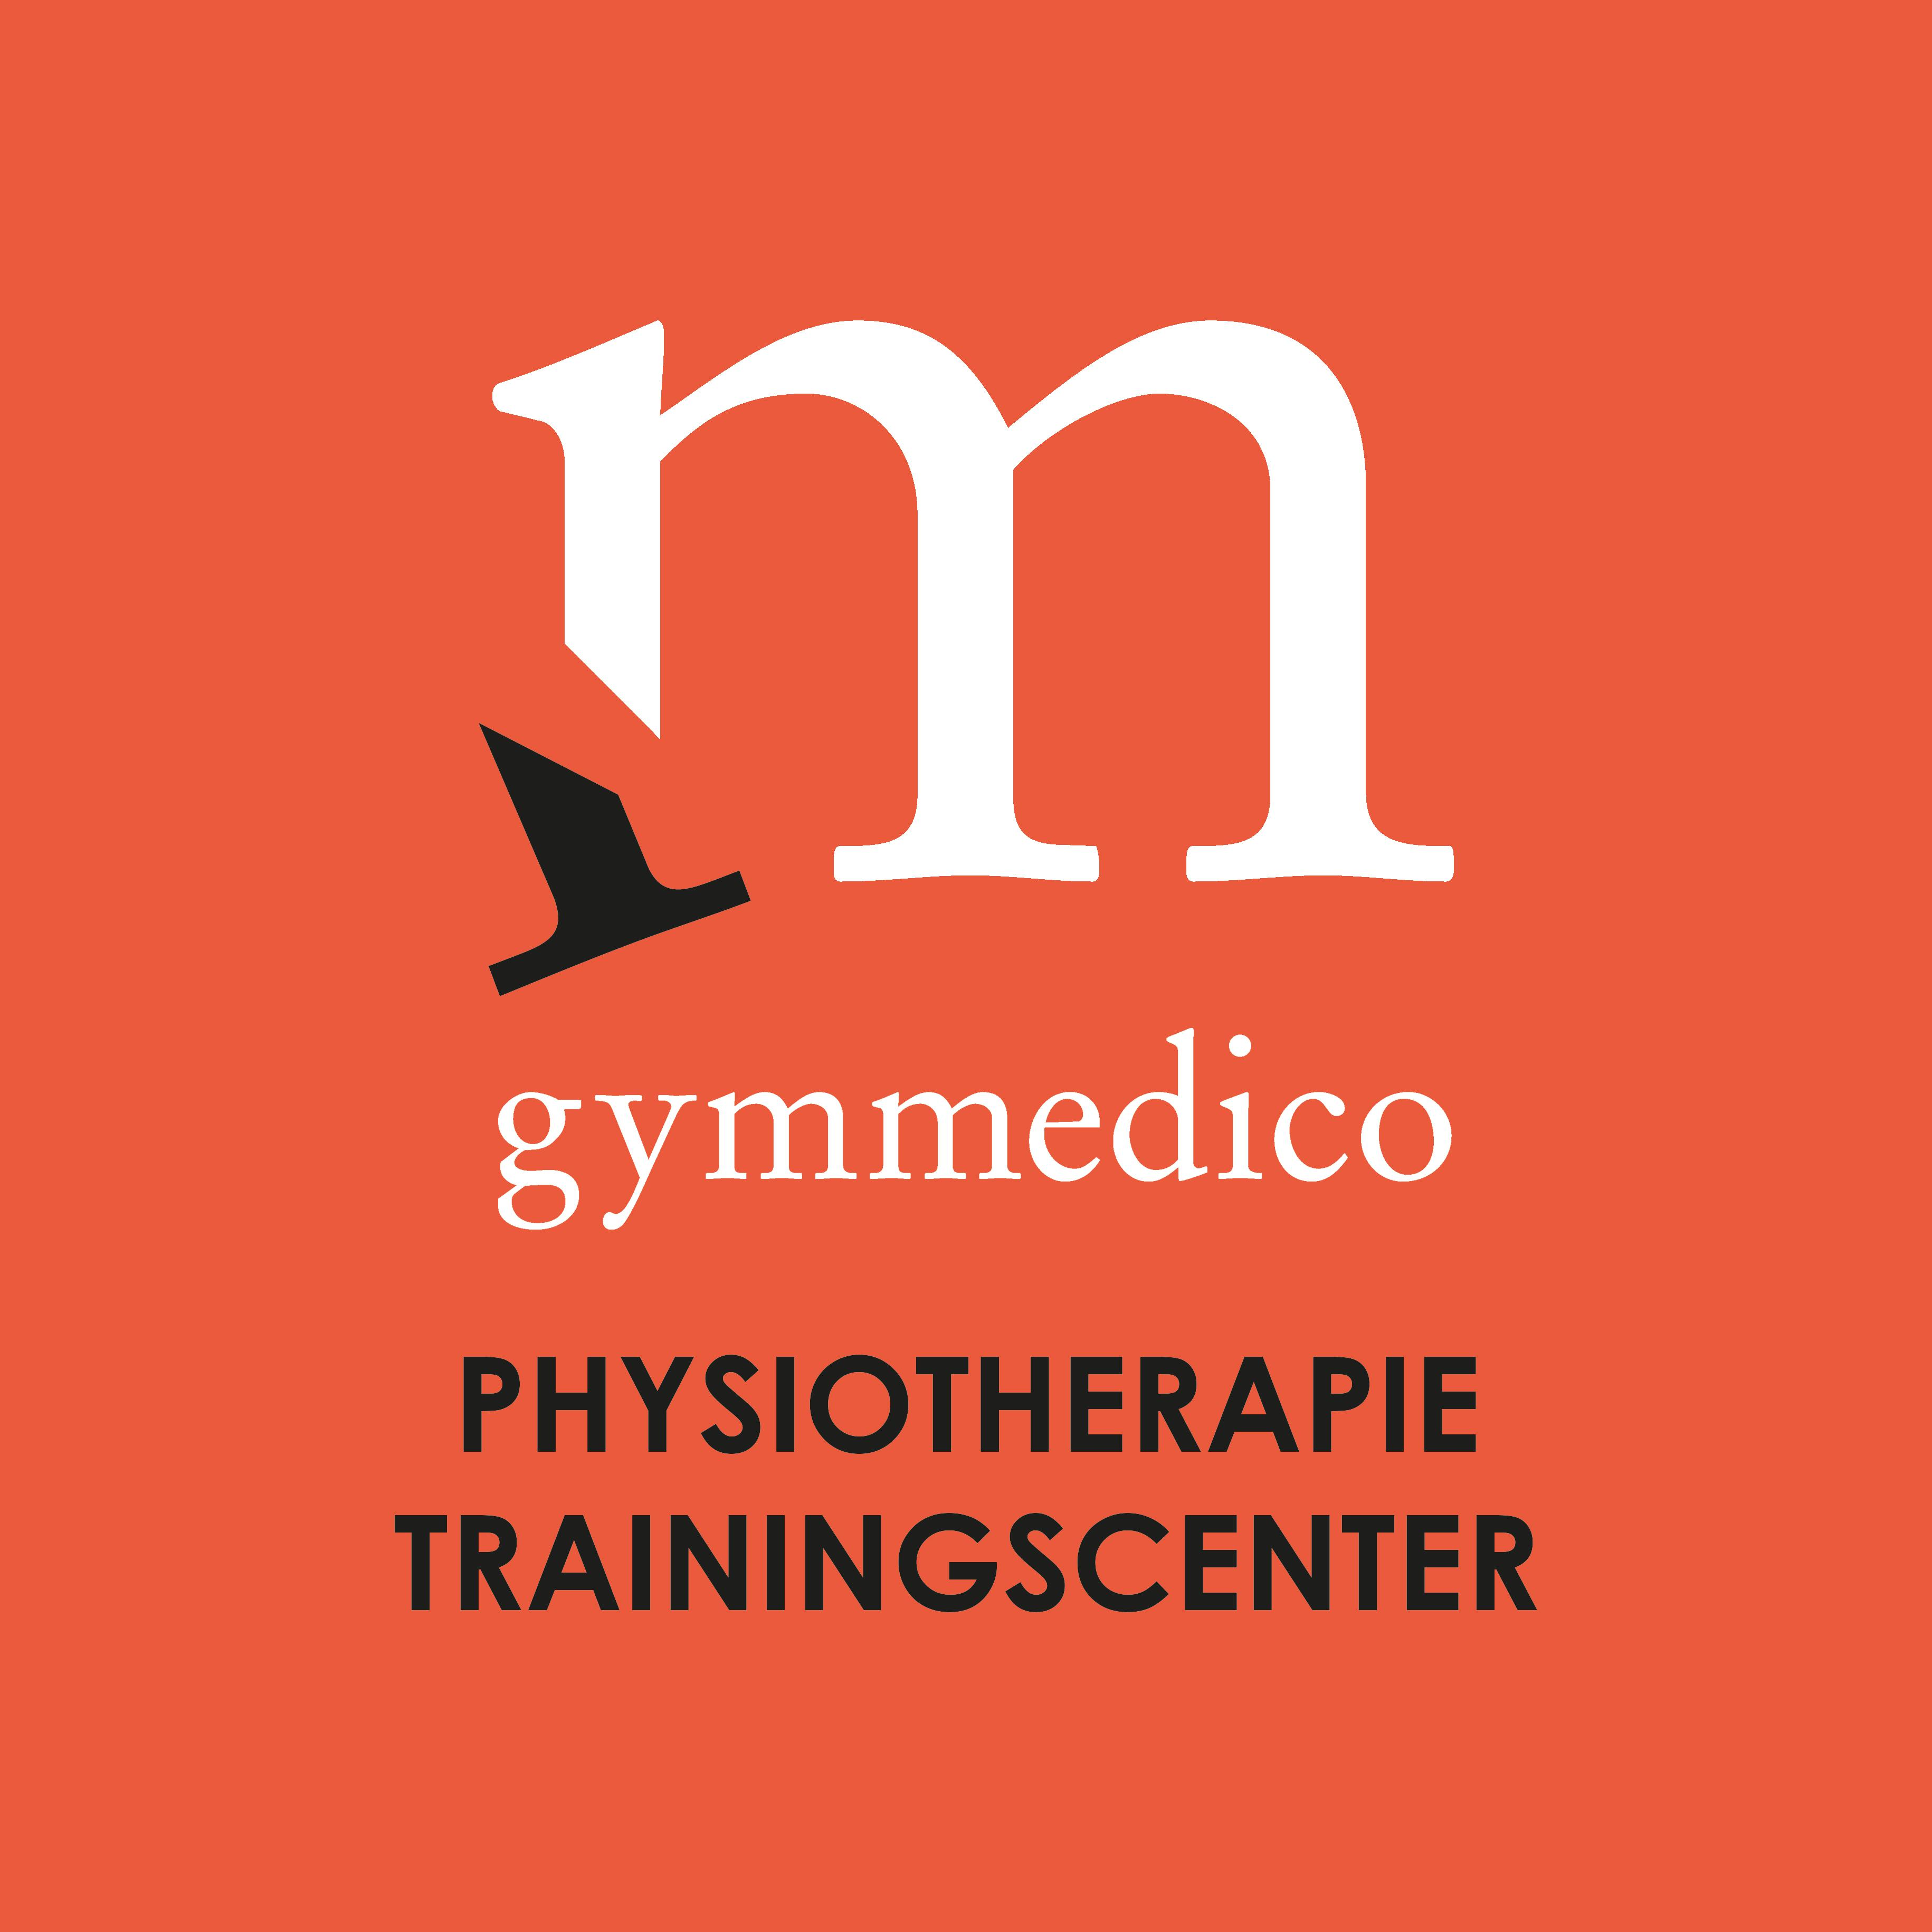 GYM medico GmbH